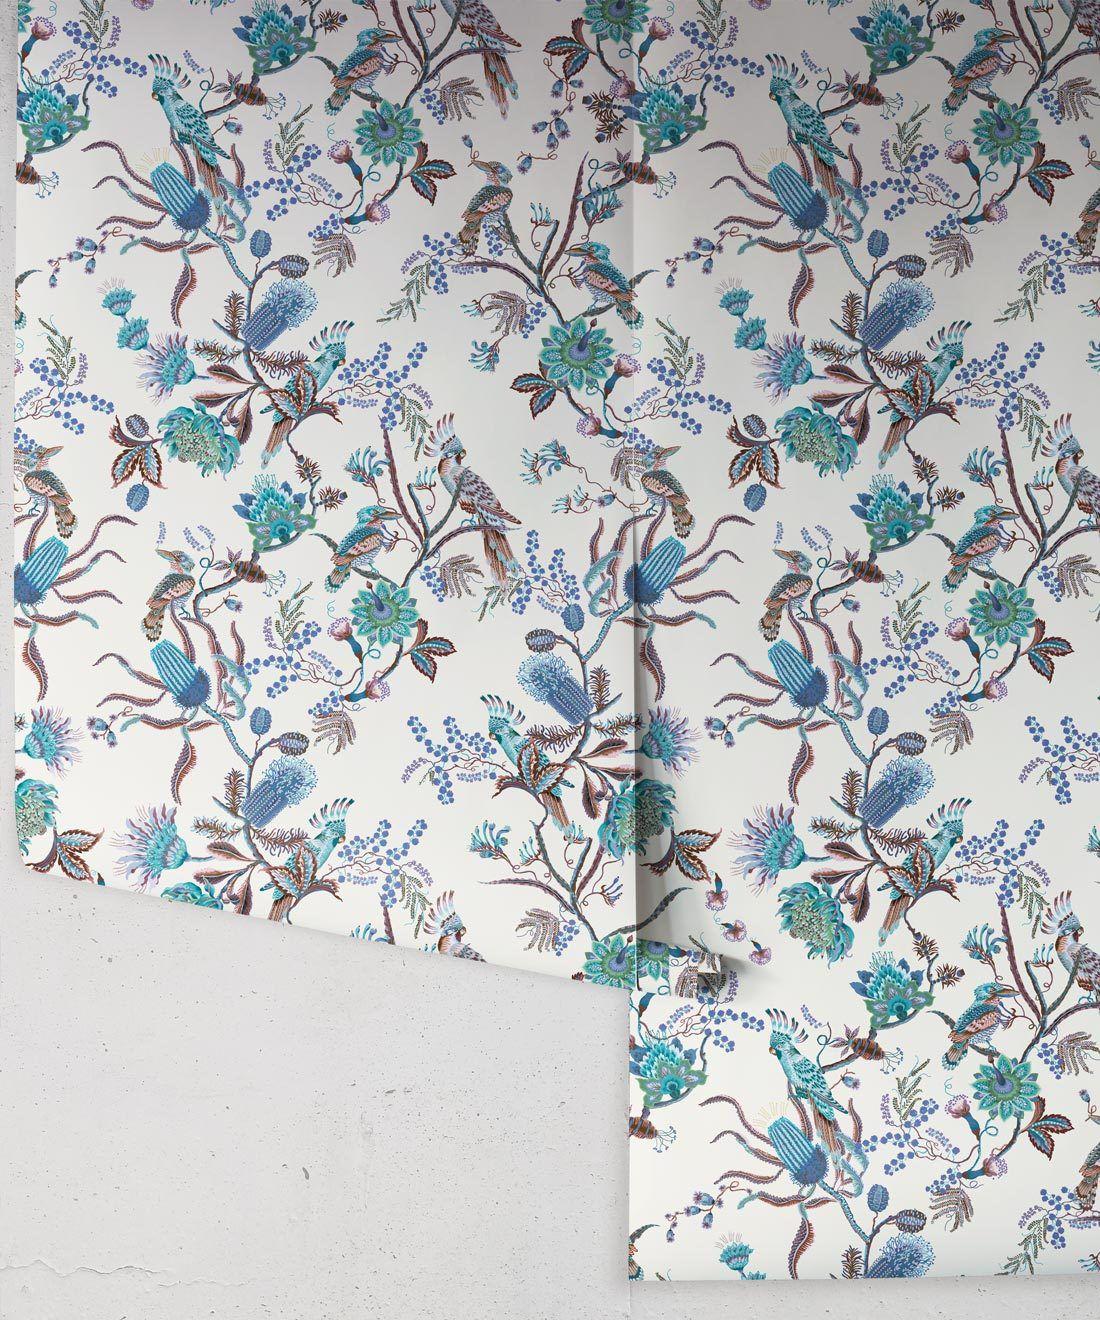 Matilda Wallpaper • Cockatoo, kookaburra • Australian Wallpaper • Milton & King USA • Blue Bell Roll